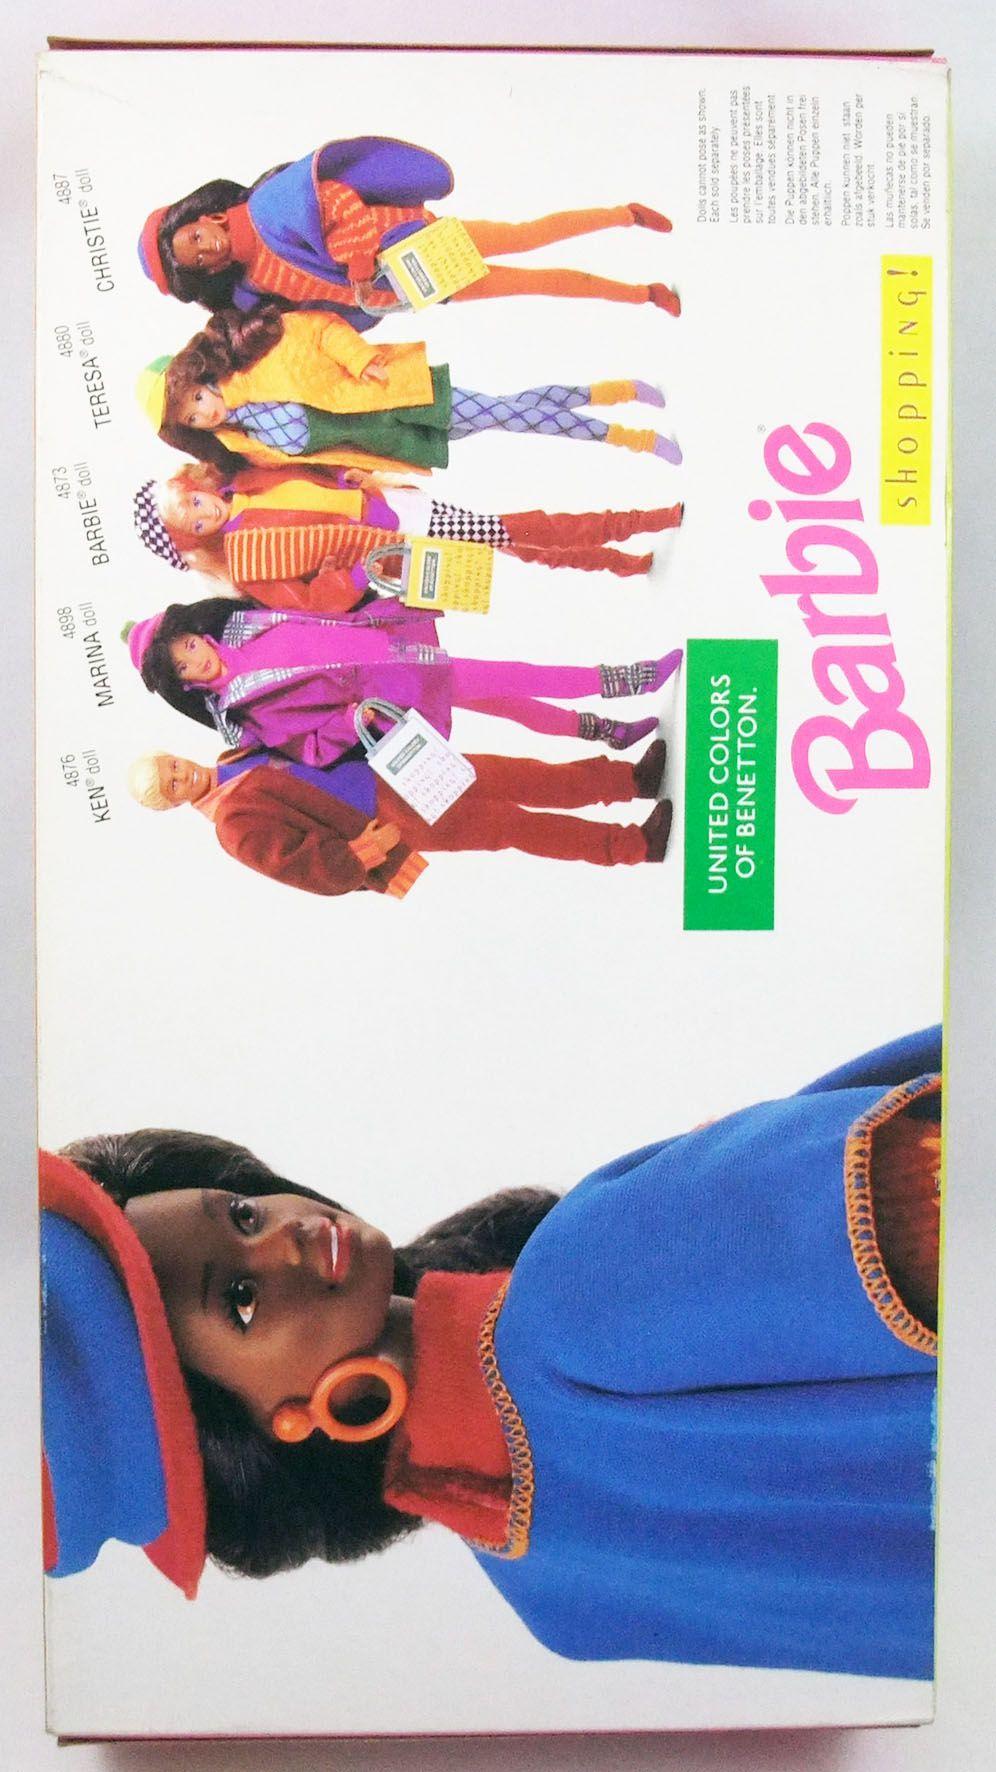 Barbie - United Colors of Benetton Shopping! Christie - Mattel 1991 (ref.4887)